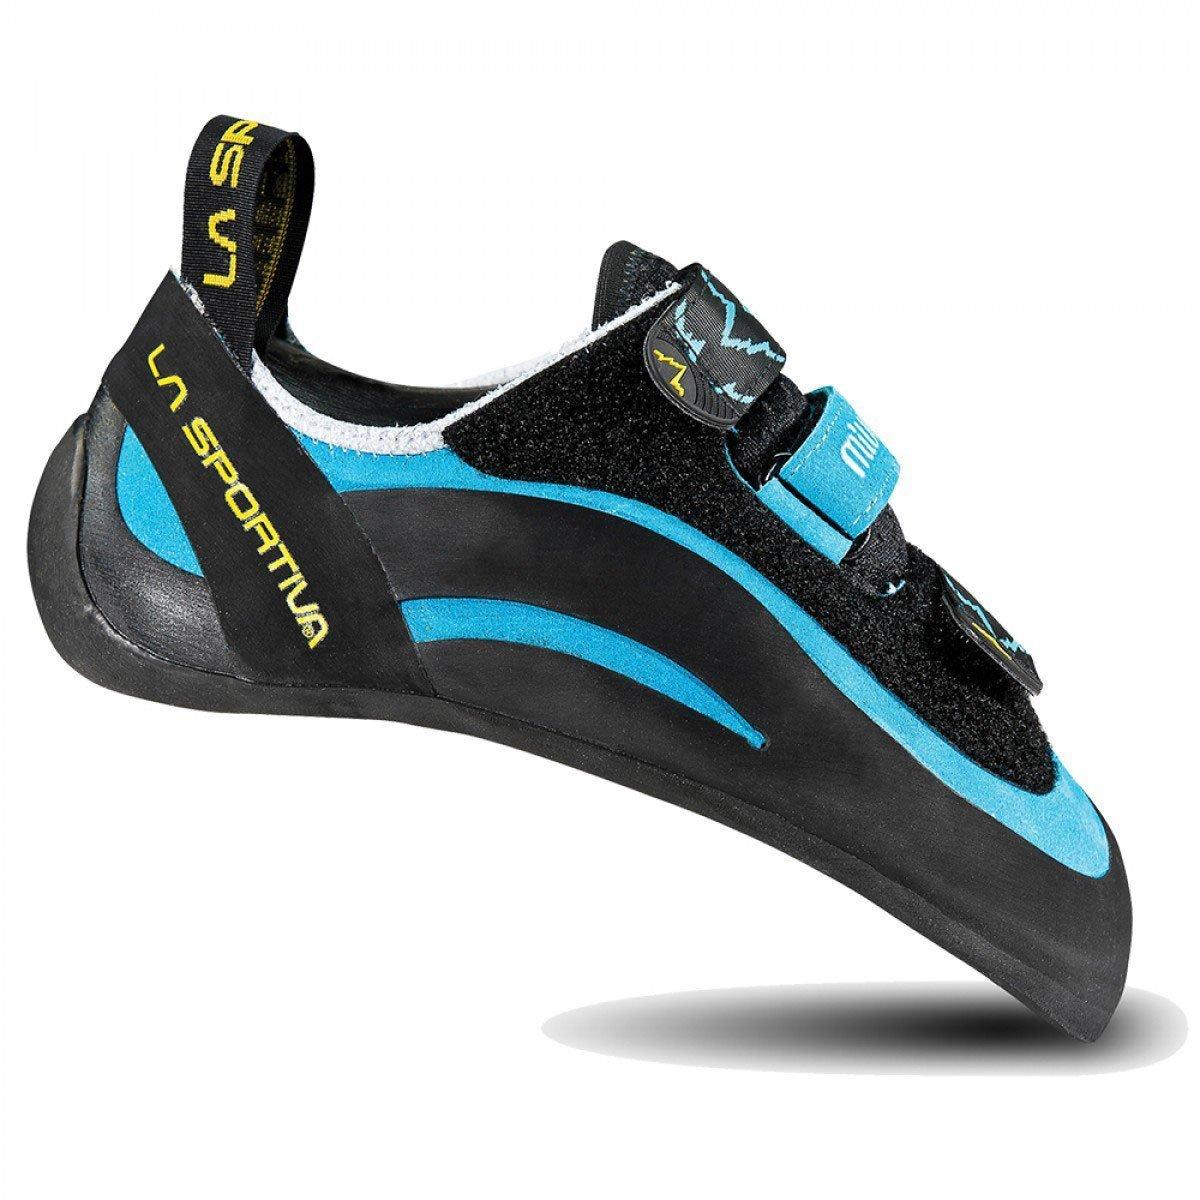 La Sportiva Miura VS Climbing Shoe - Women's B01B6JHKDS 36 M EU|Blue